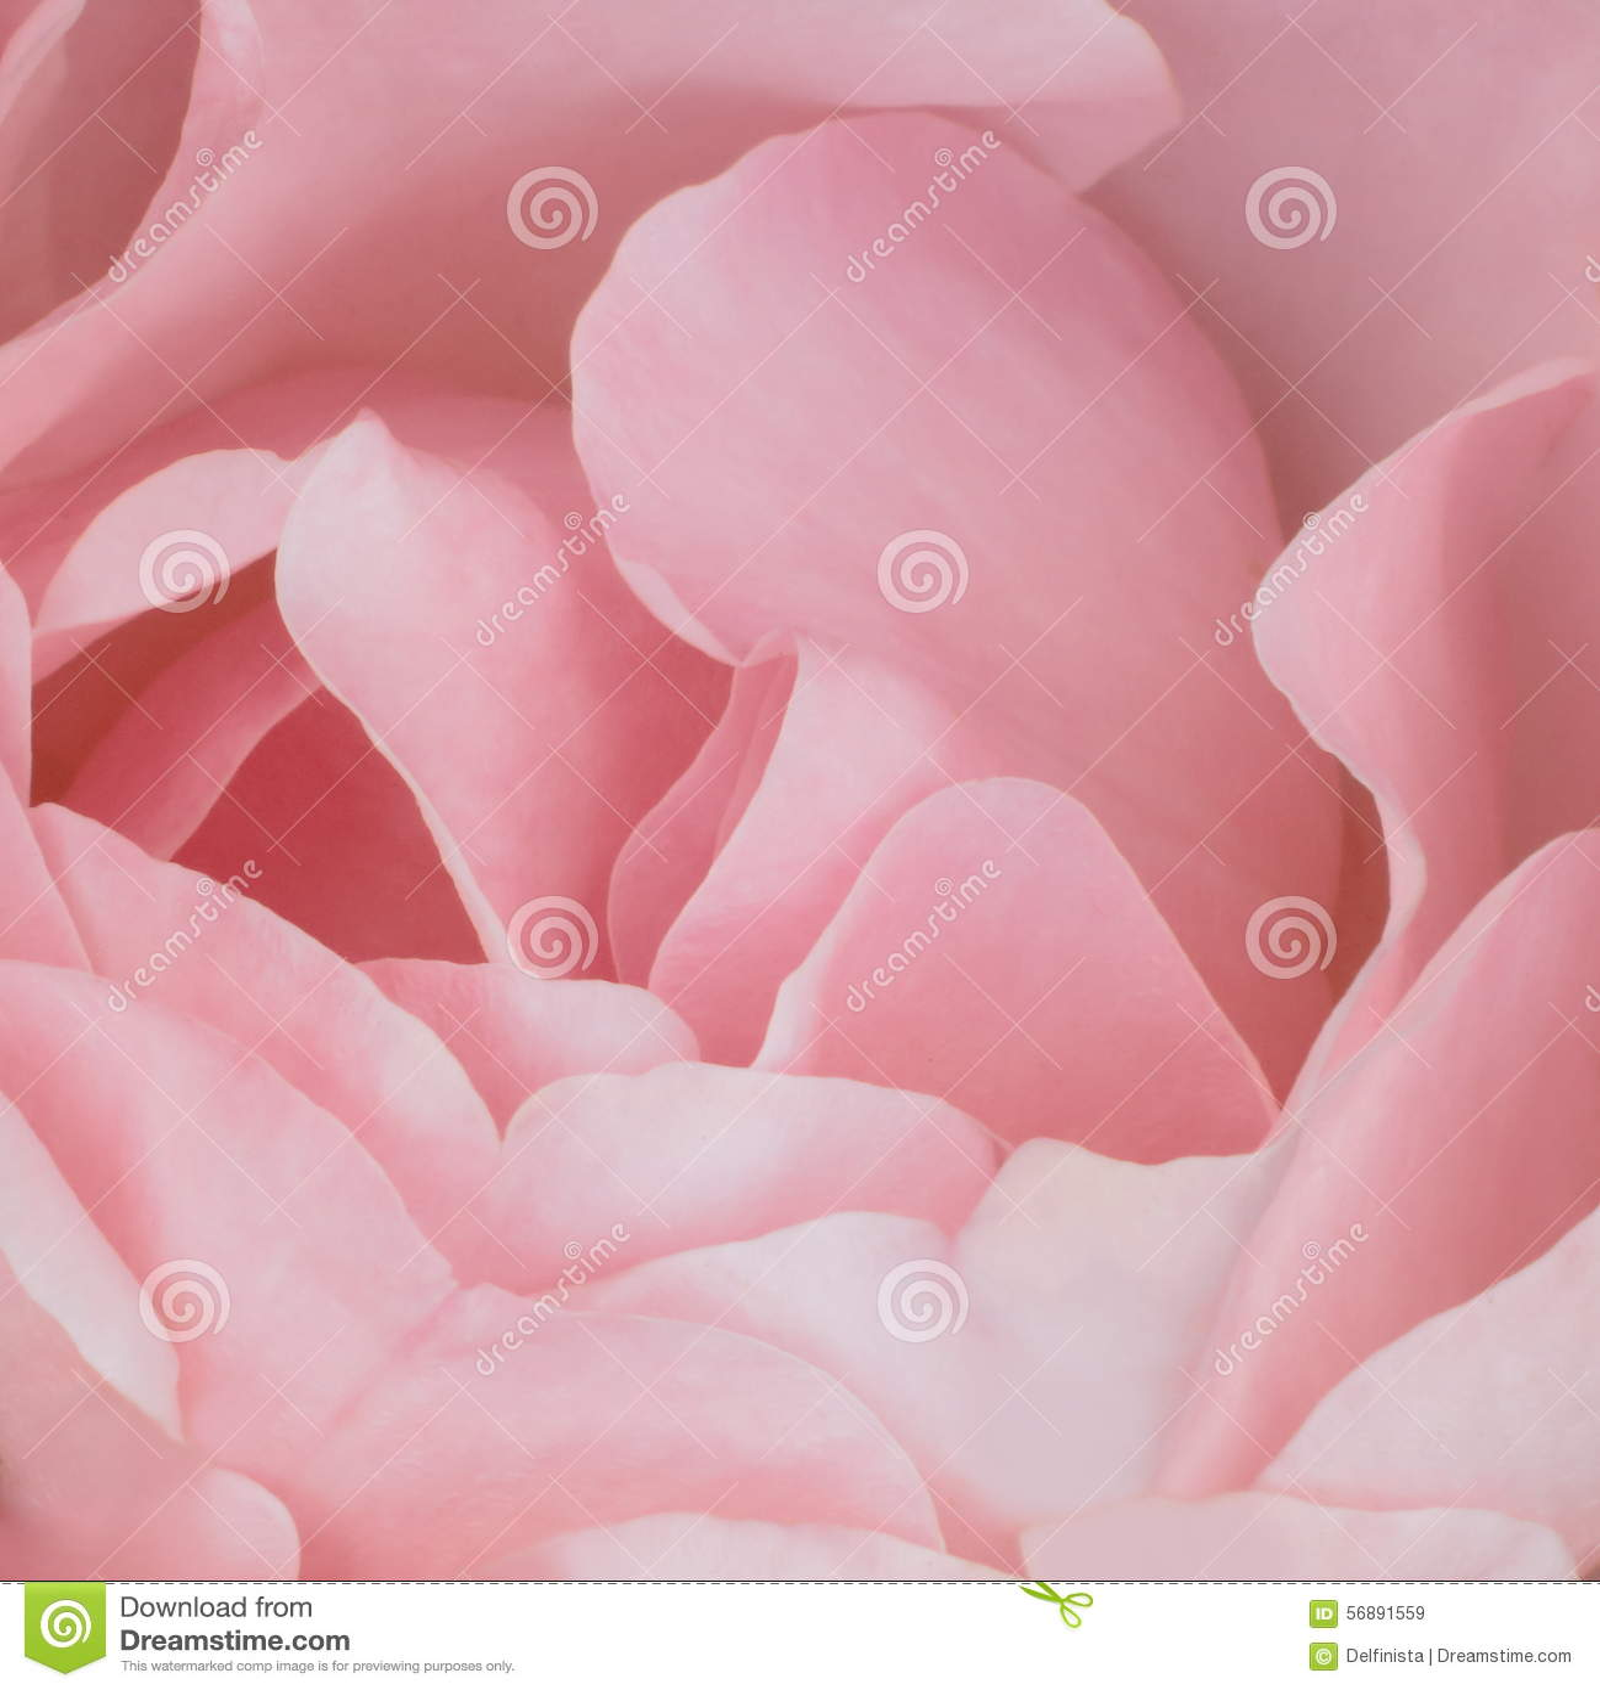 Fondo rosa: Rose Stock Photos